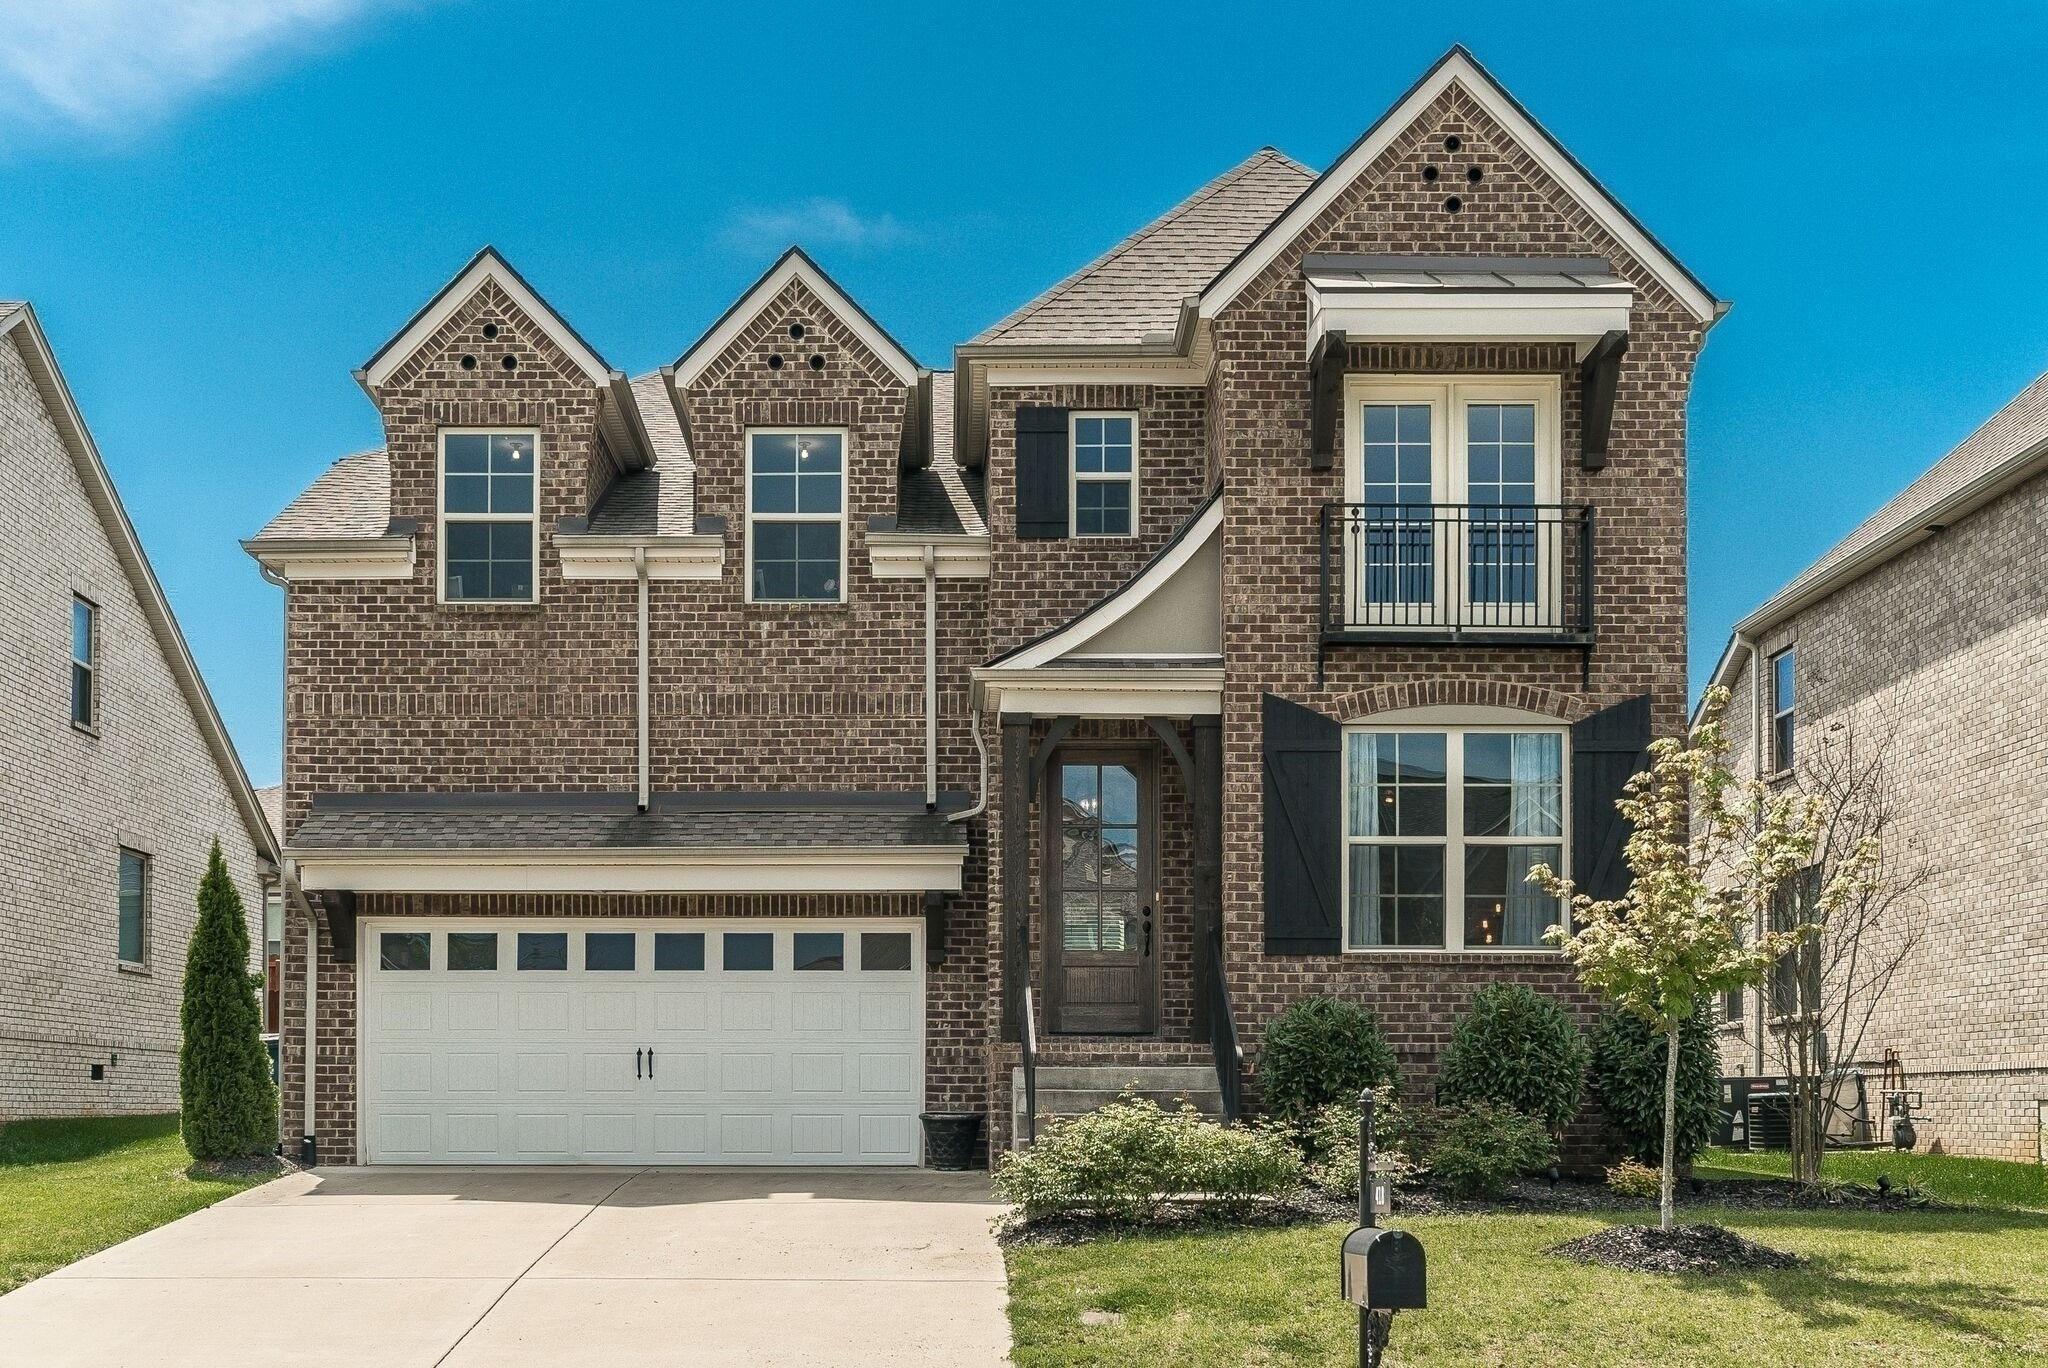 418 Fall Creek Cir, Goodlettsville, TN 37072 - Goodlettsville, TN real estate listing